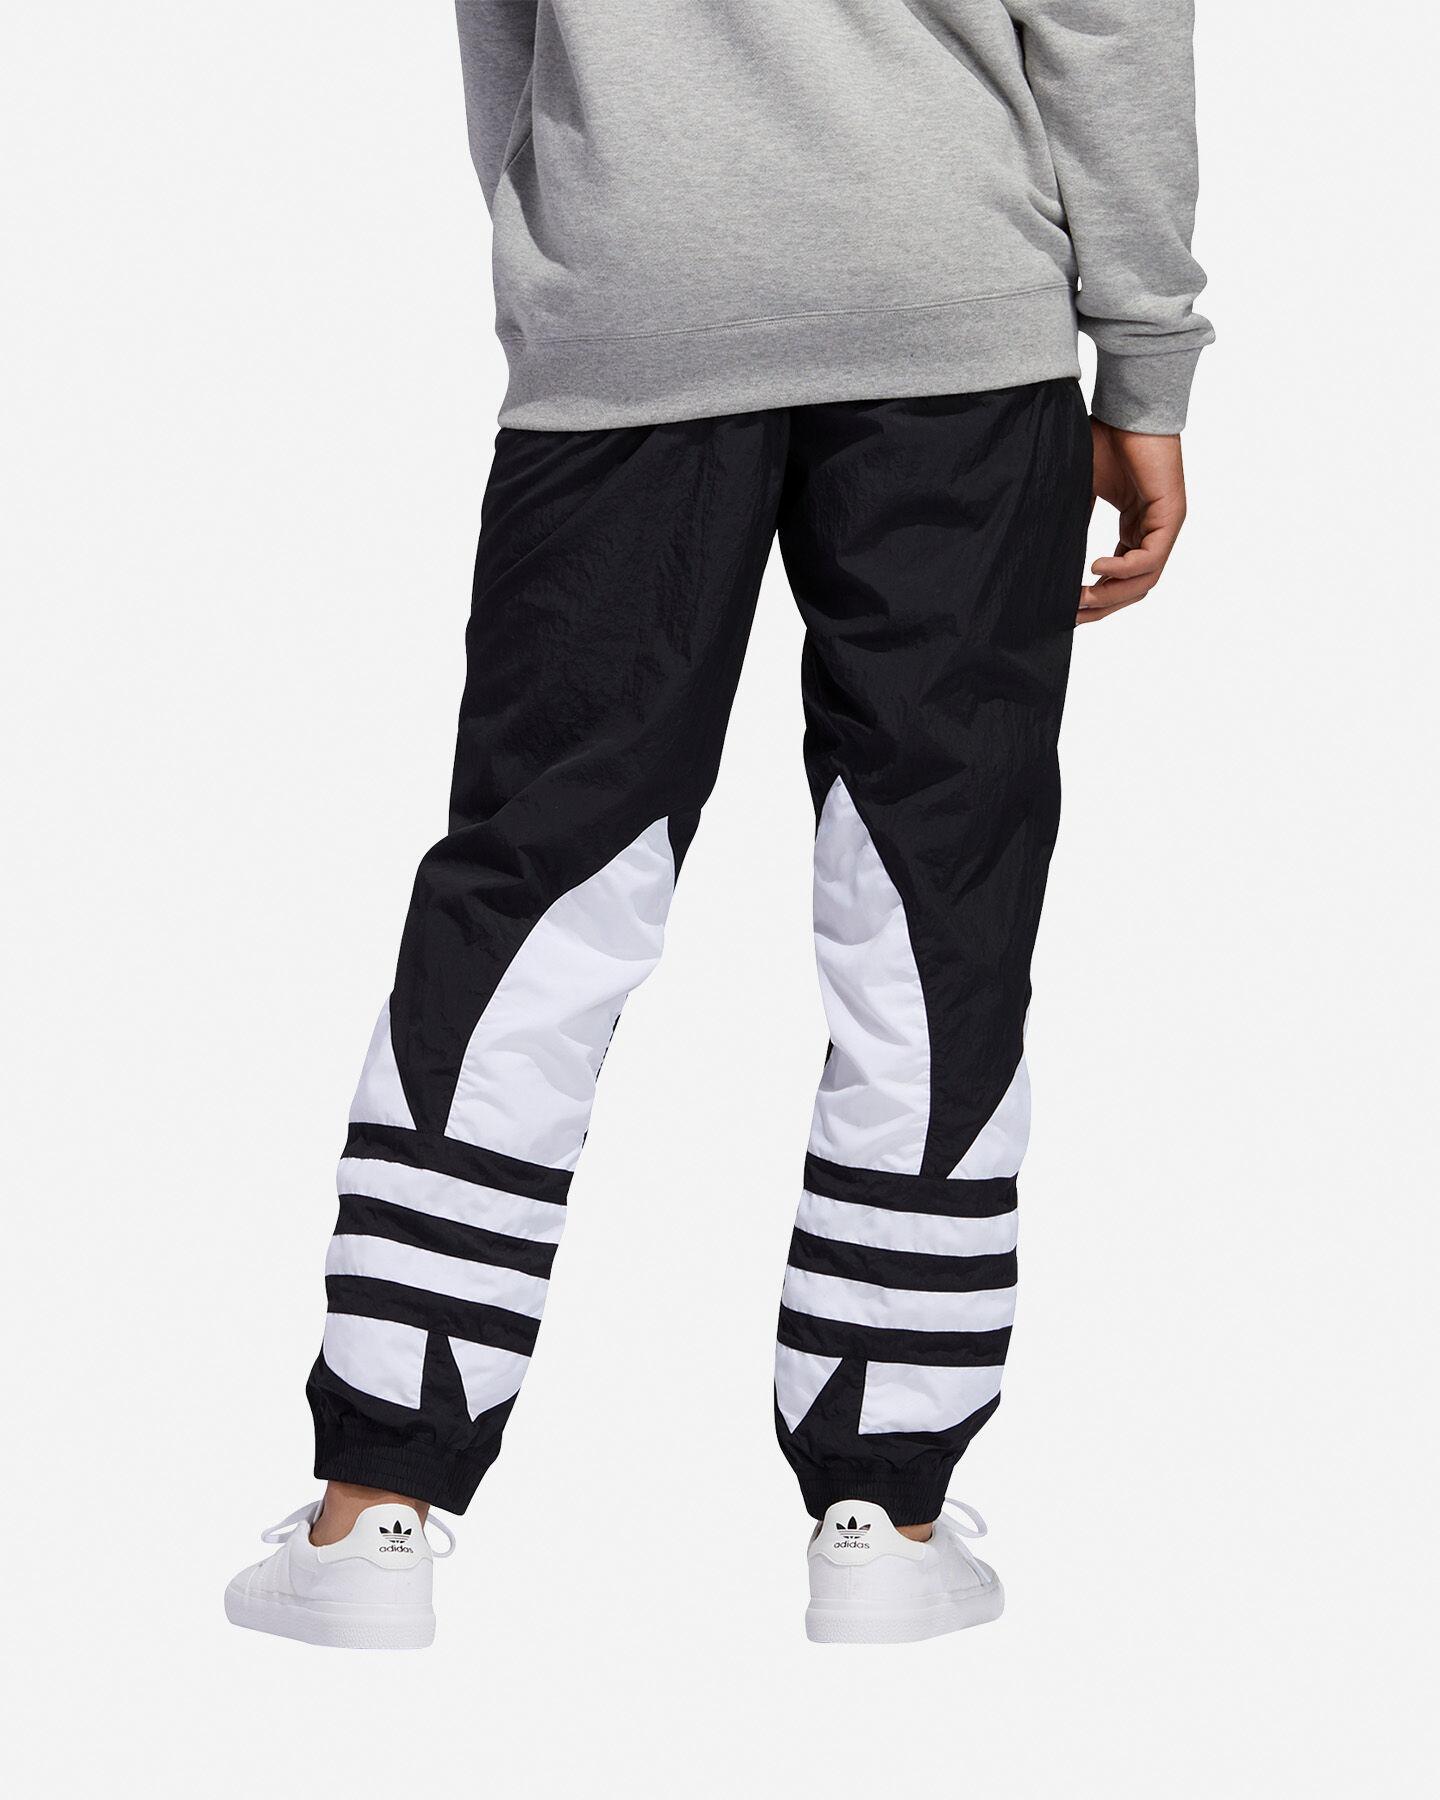 Pantalone ADIDAS BIG TREFOIL M S5149461 scatto 4